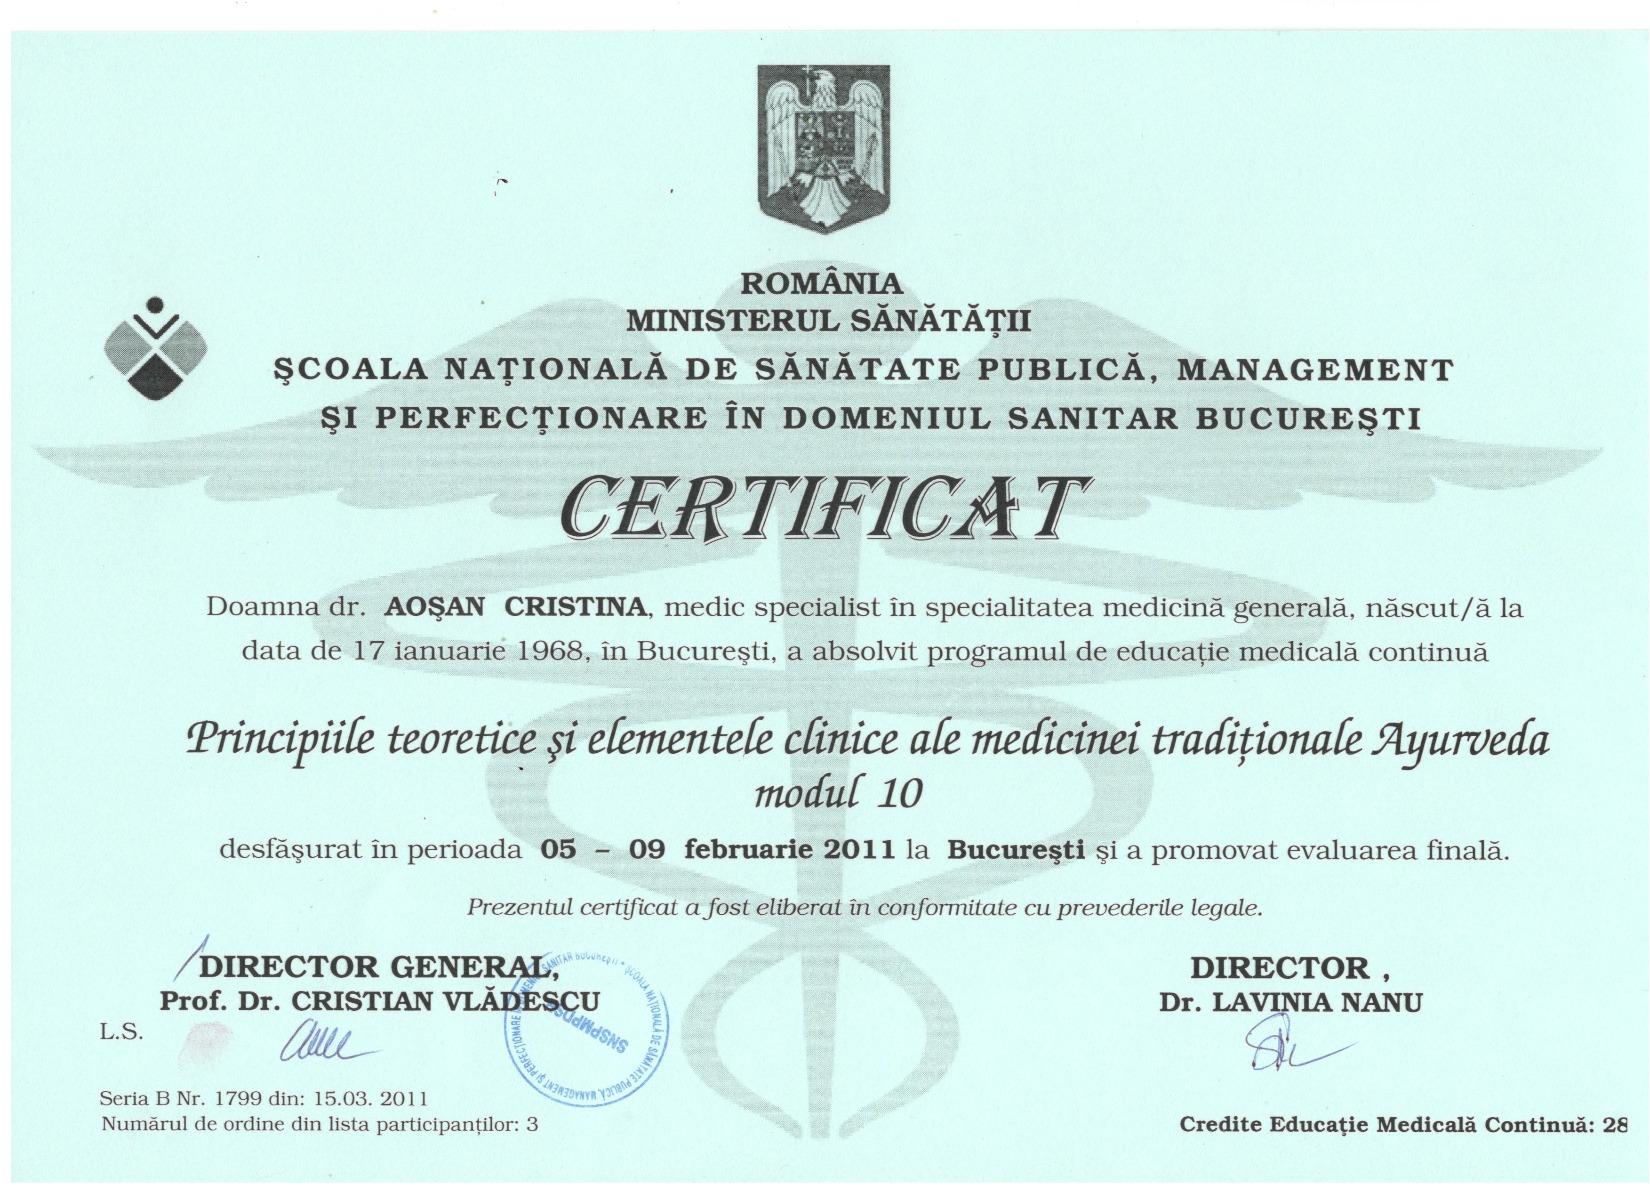 Certificat SNSP Ministerul Sanatatii, Ayurveda